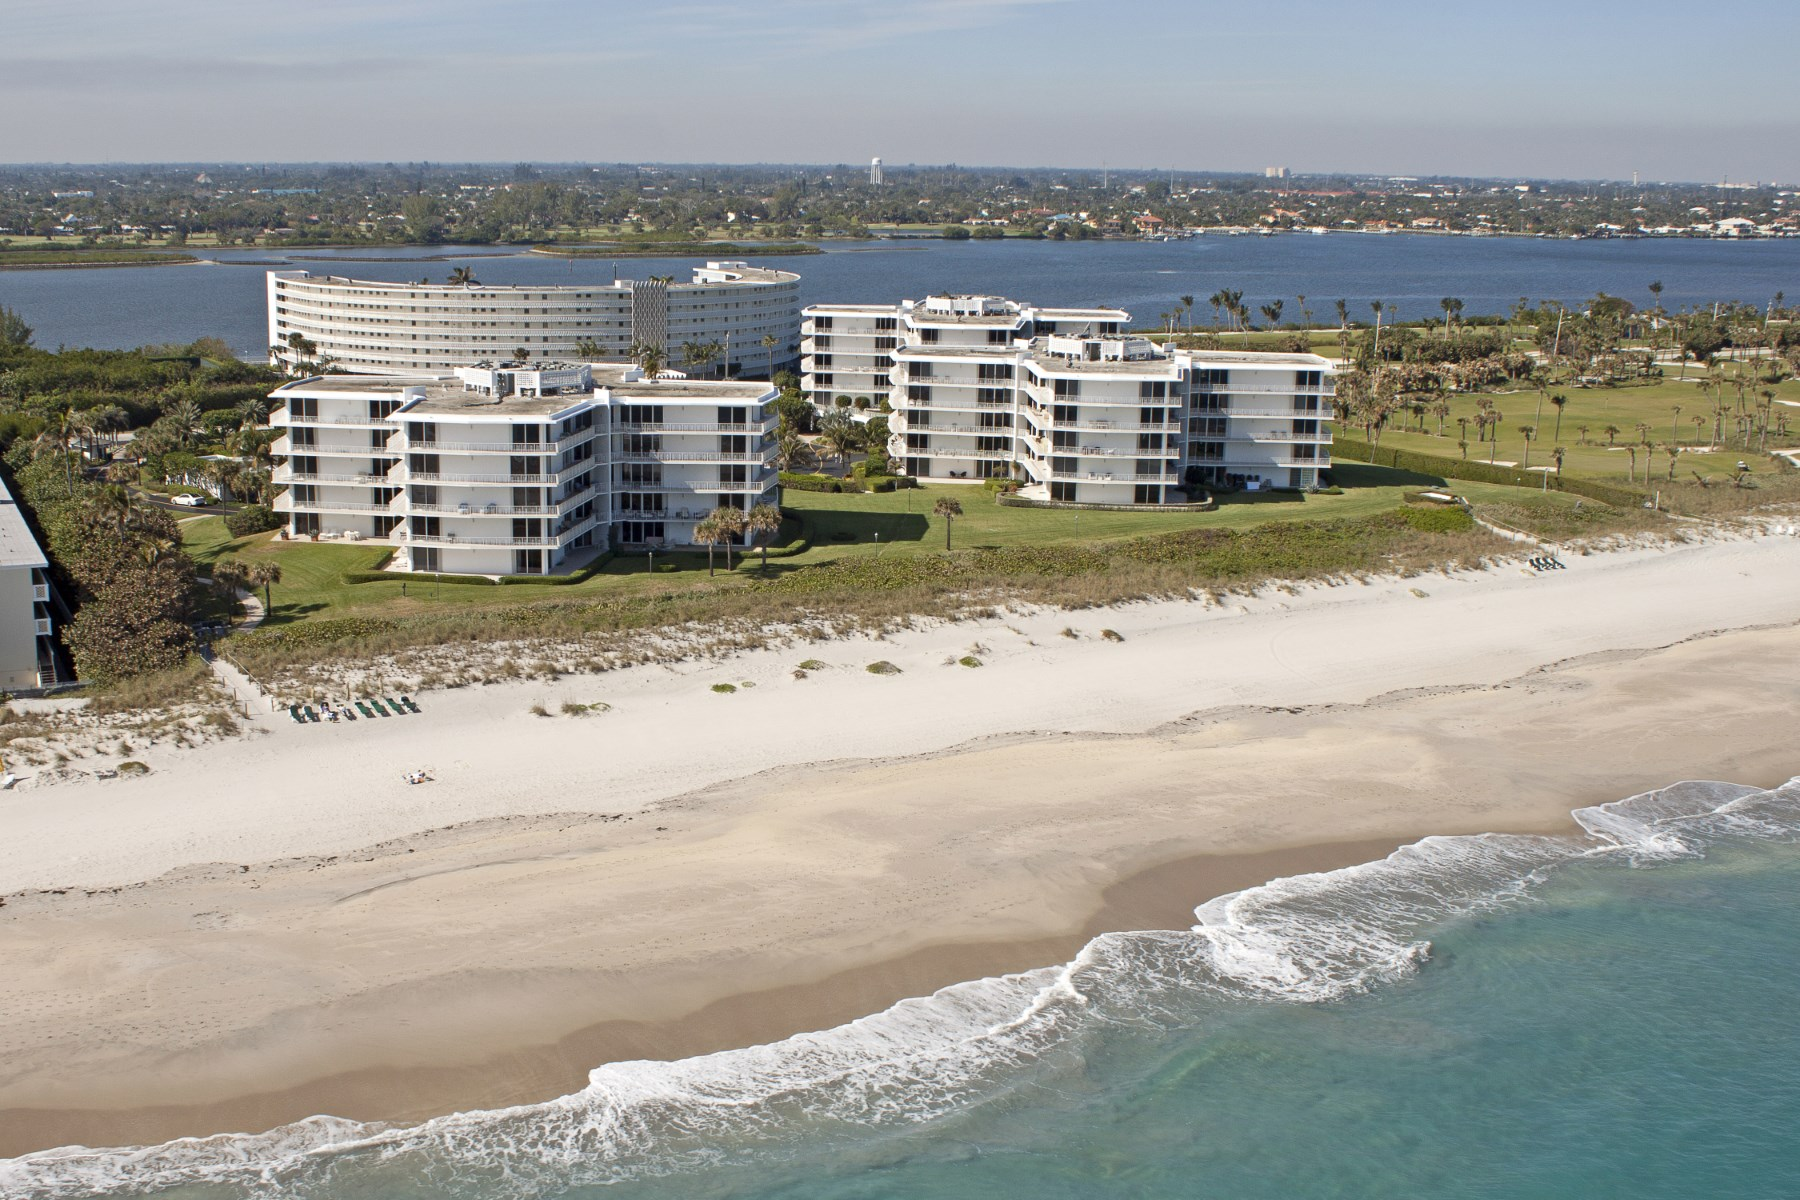 Condominium for Sale at Oceanfront Palm Beach Condo Palm Beach, Florida 33480 United States